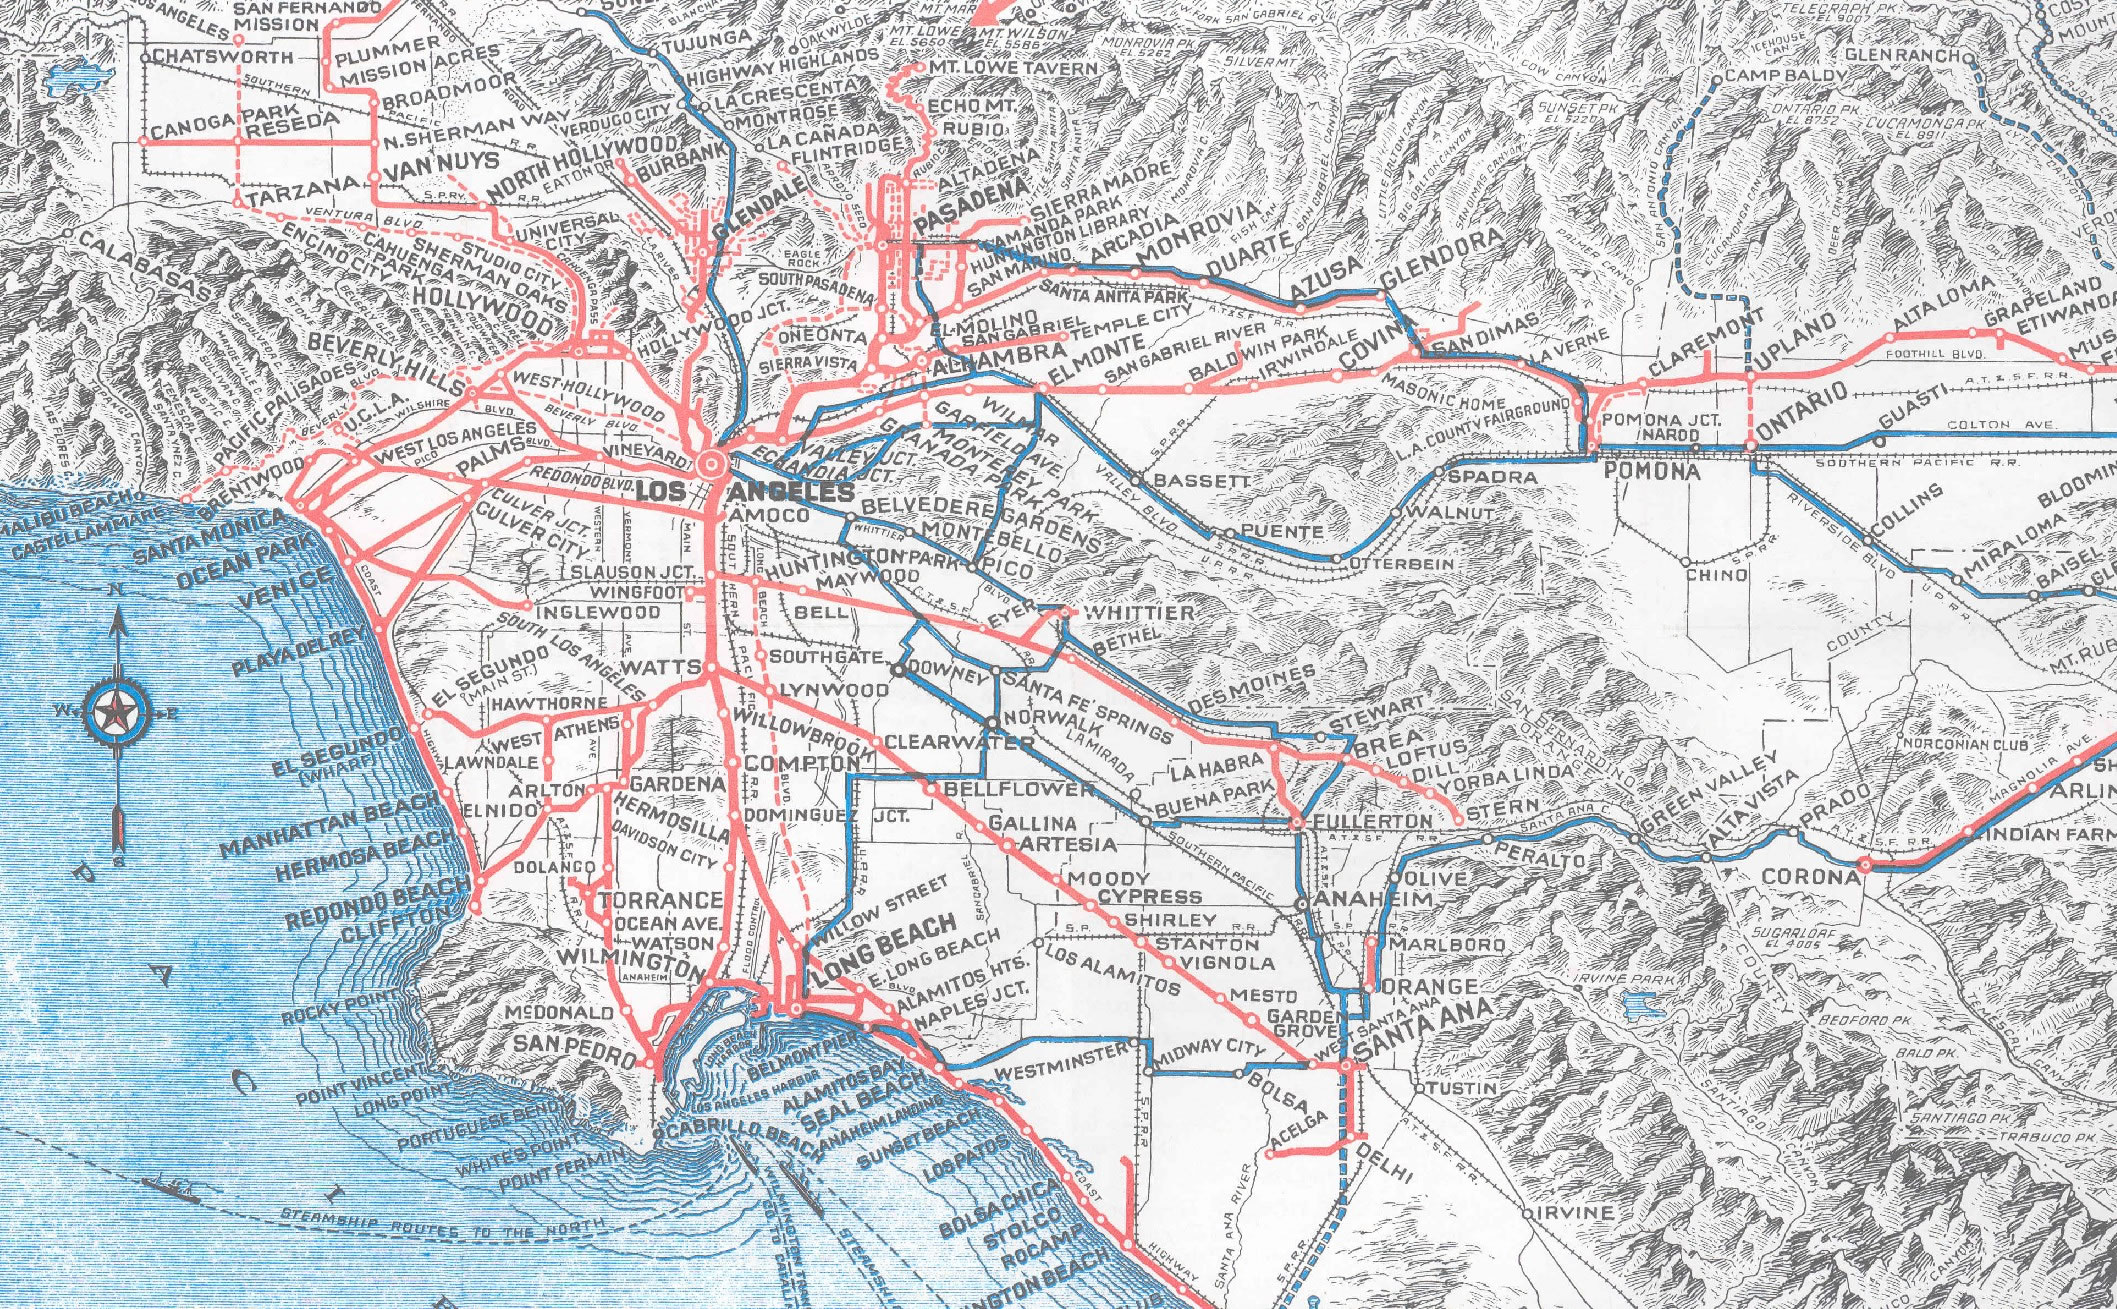 La Subway Map Red Line.The Harbor Subdivision And South La La Thrives